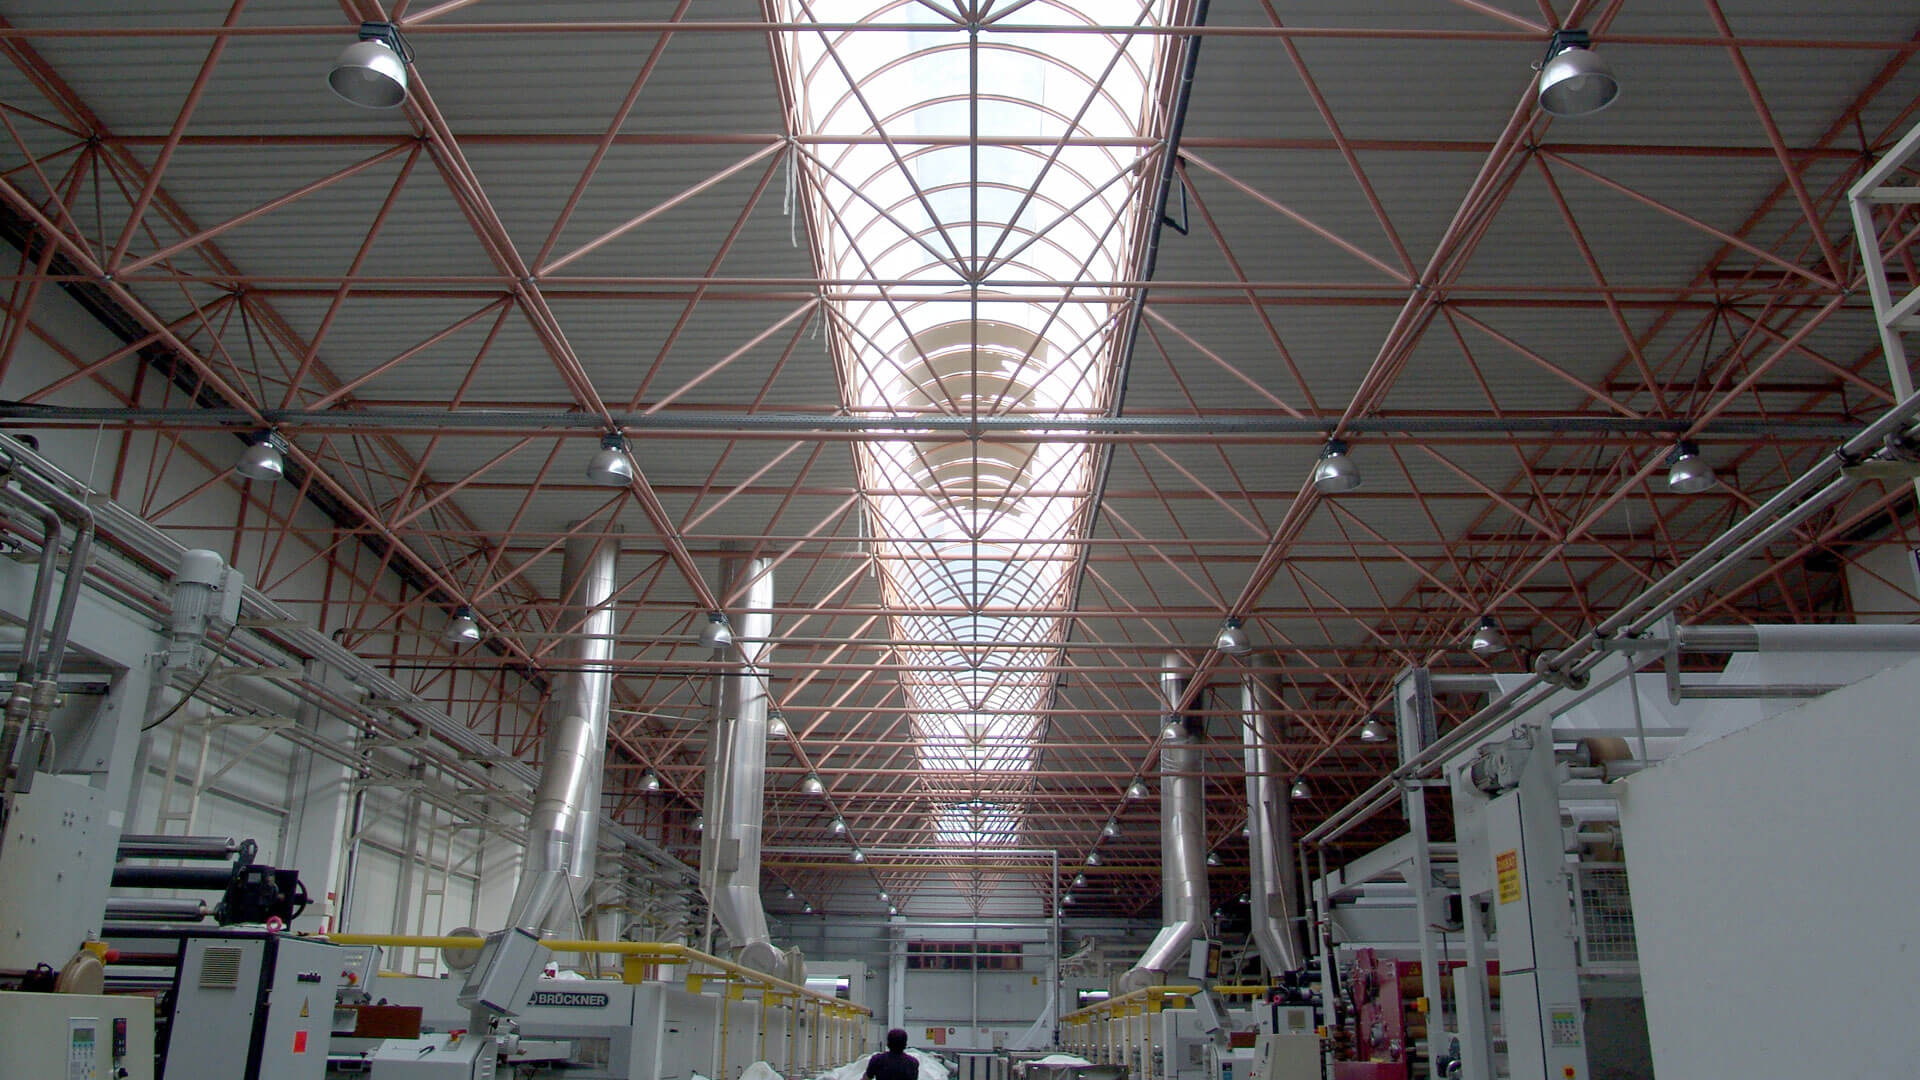 سازه فضایی سقف کارخانه درخشان